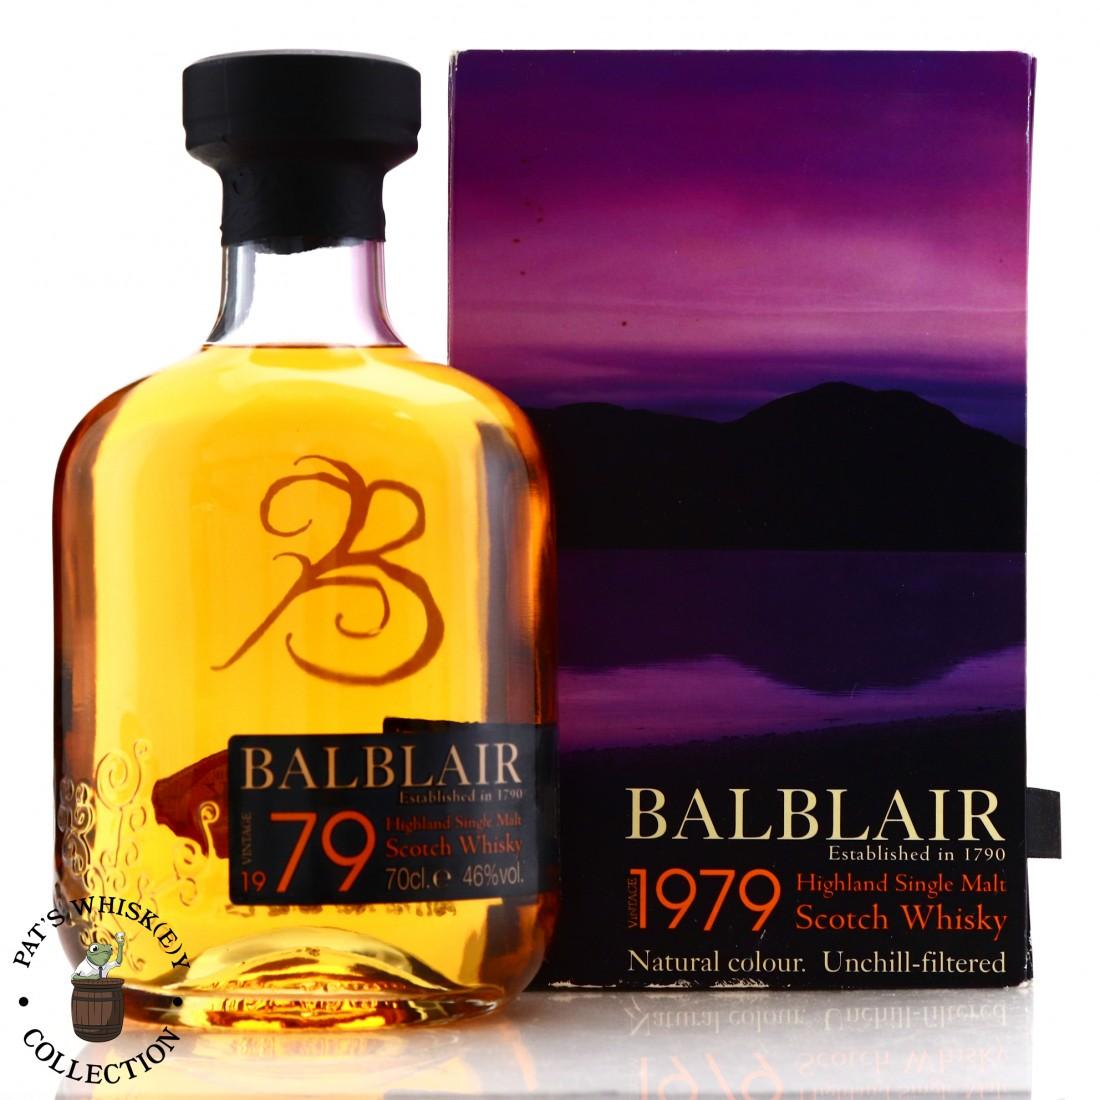 Balblair 1979 1st Release